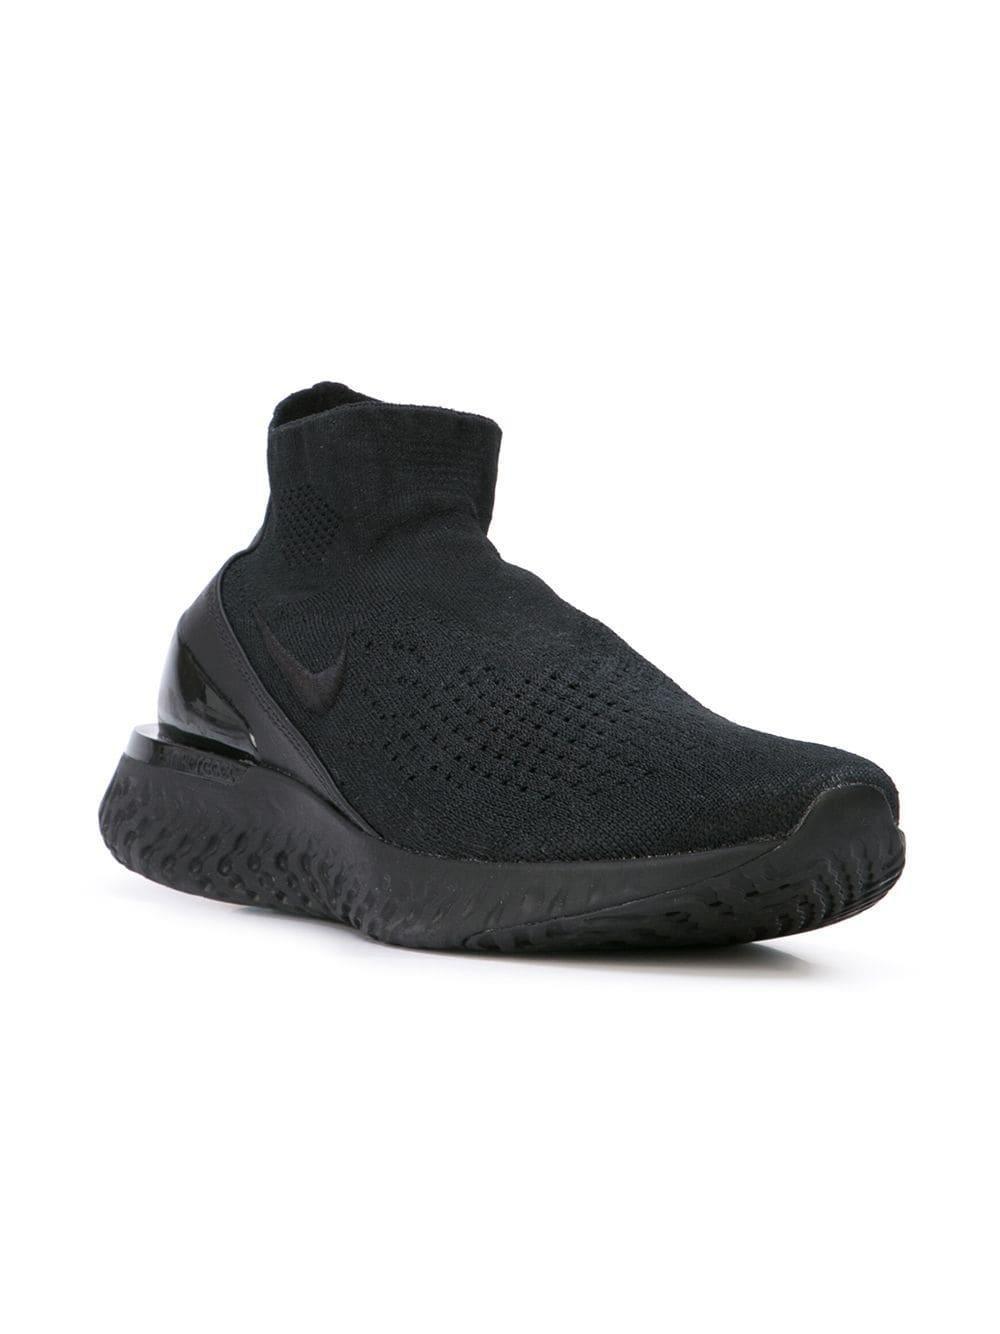 117c95d1bcd Nike Flyknit Sneakers in Black for Men - Save 11.555555555555557% - Lyst